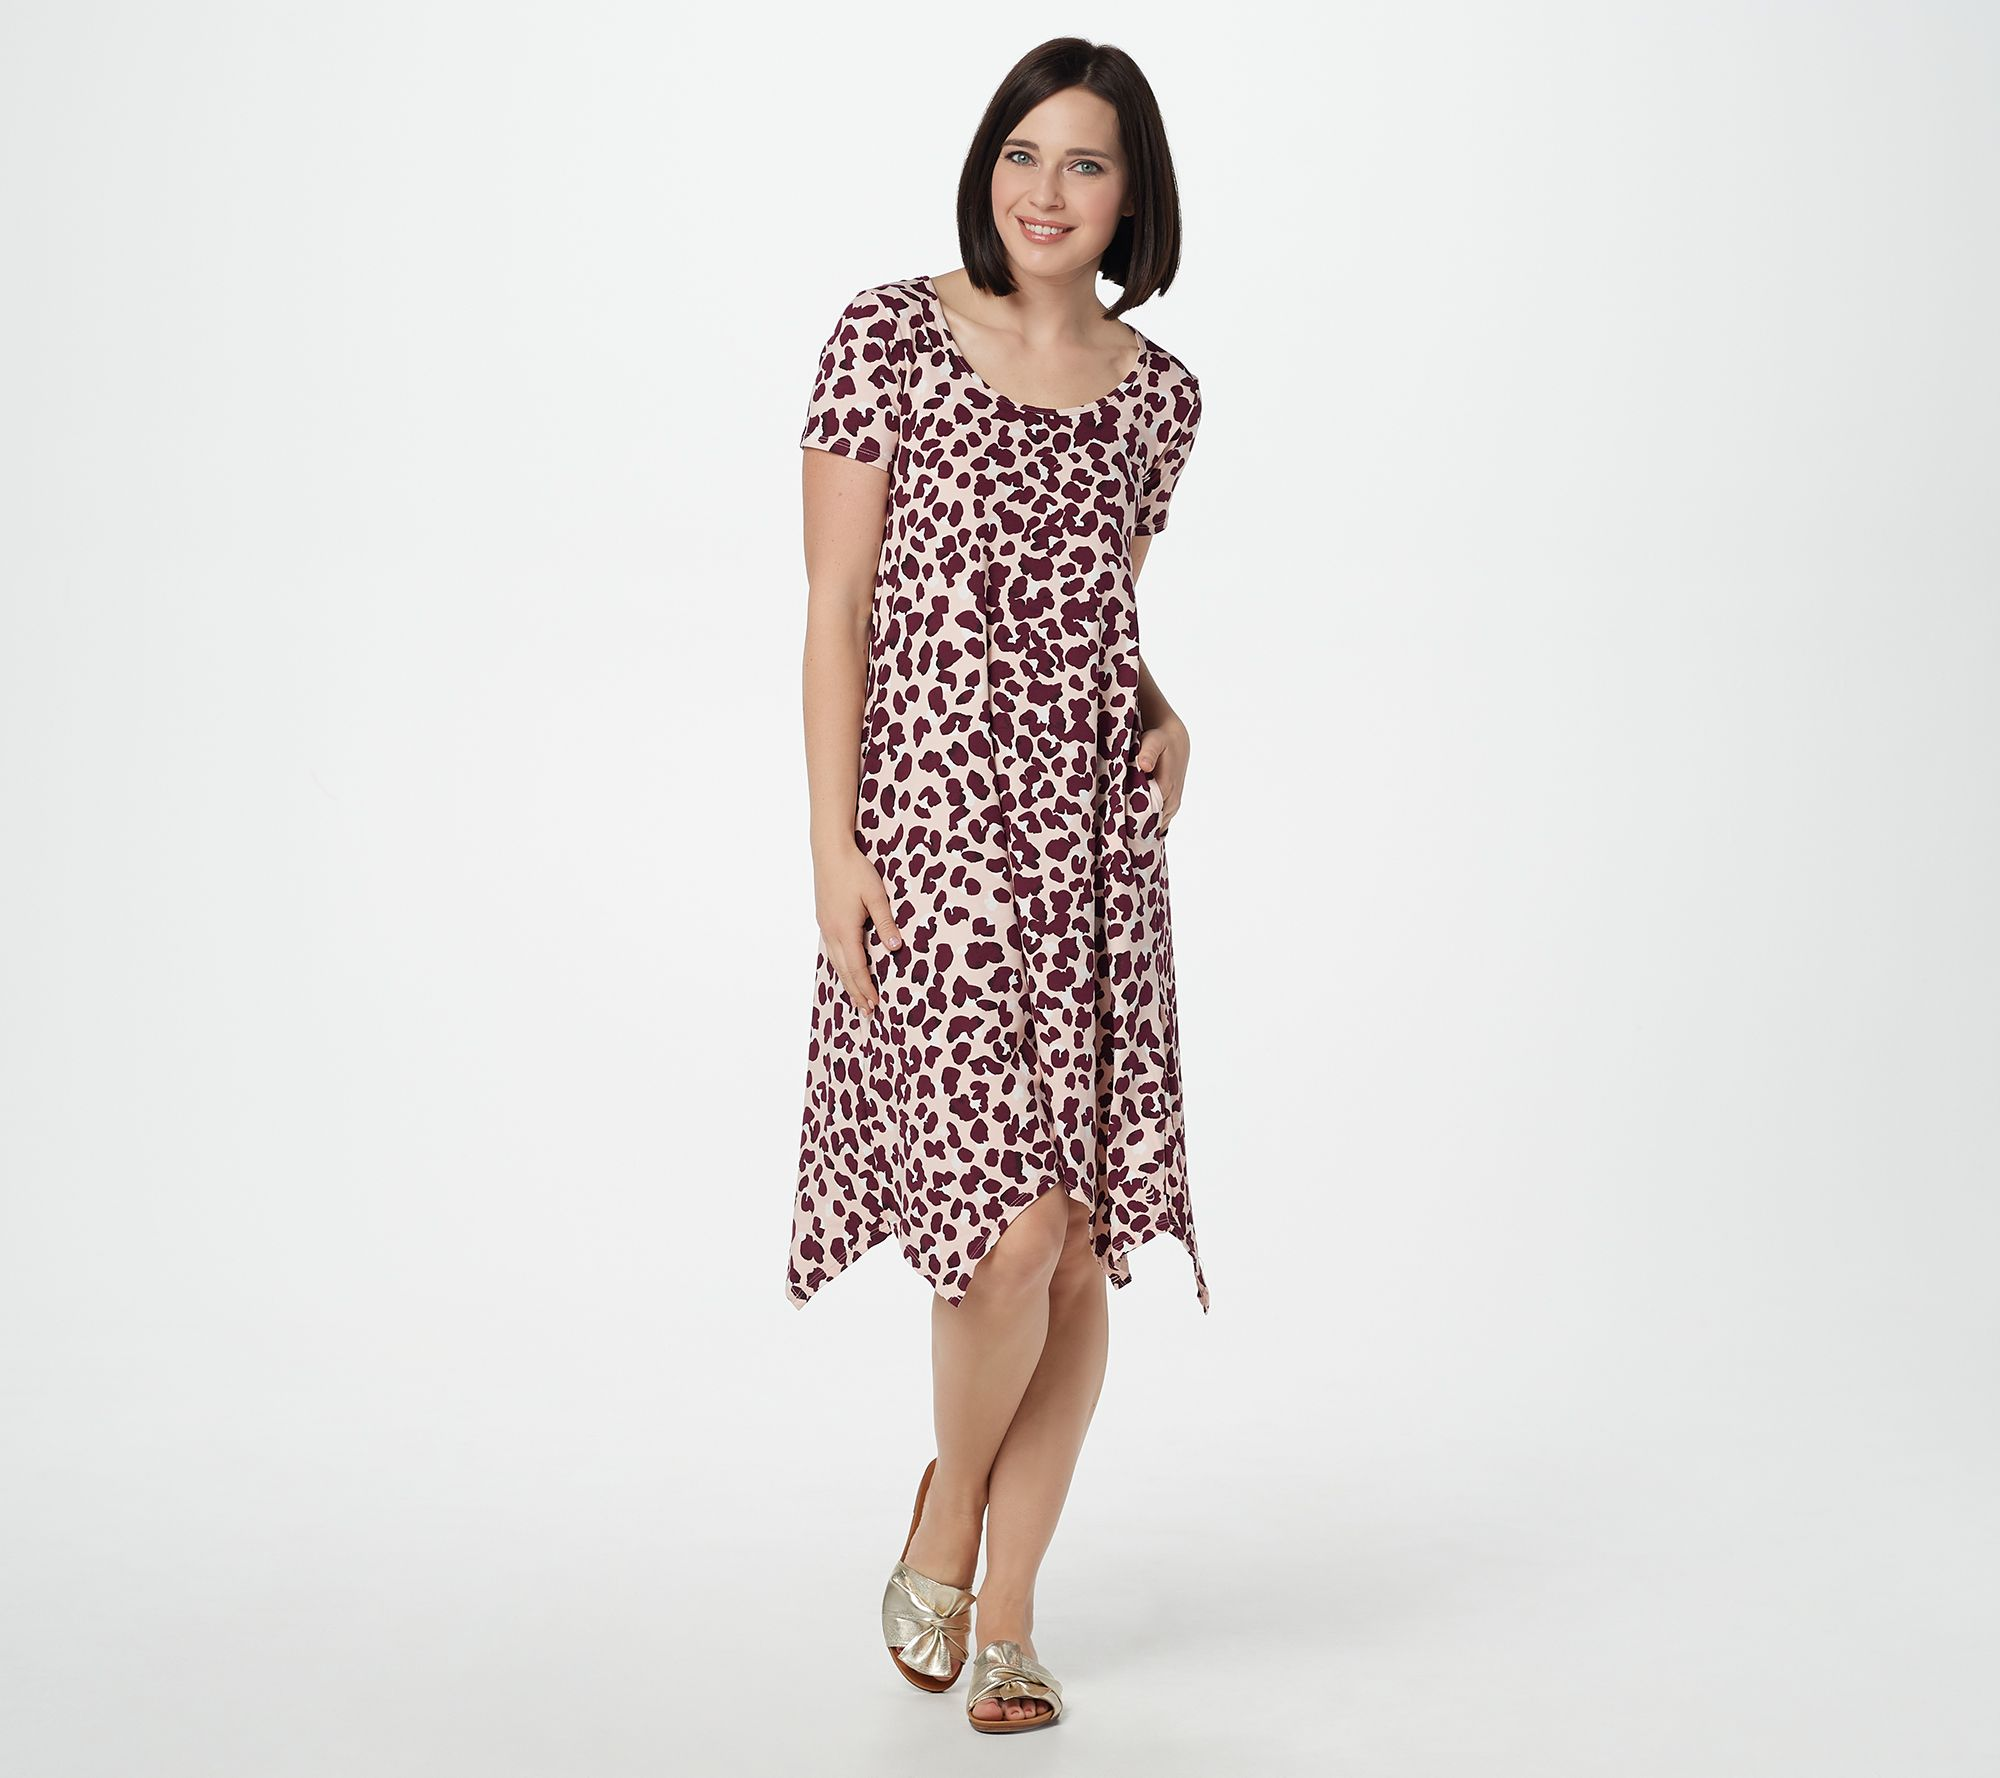 Cuddl Duds Flexwear Petite Handkerchief Dress Painted Floral PXL NEW A302370